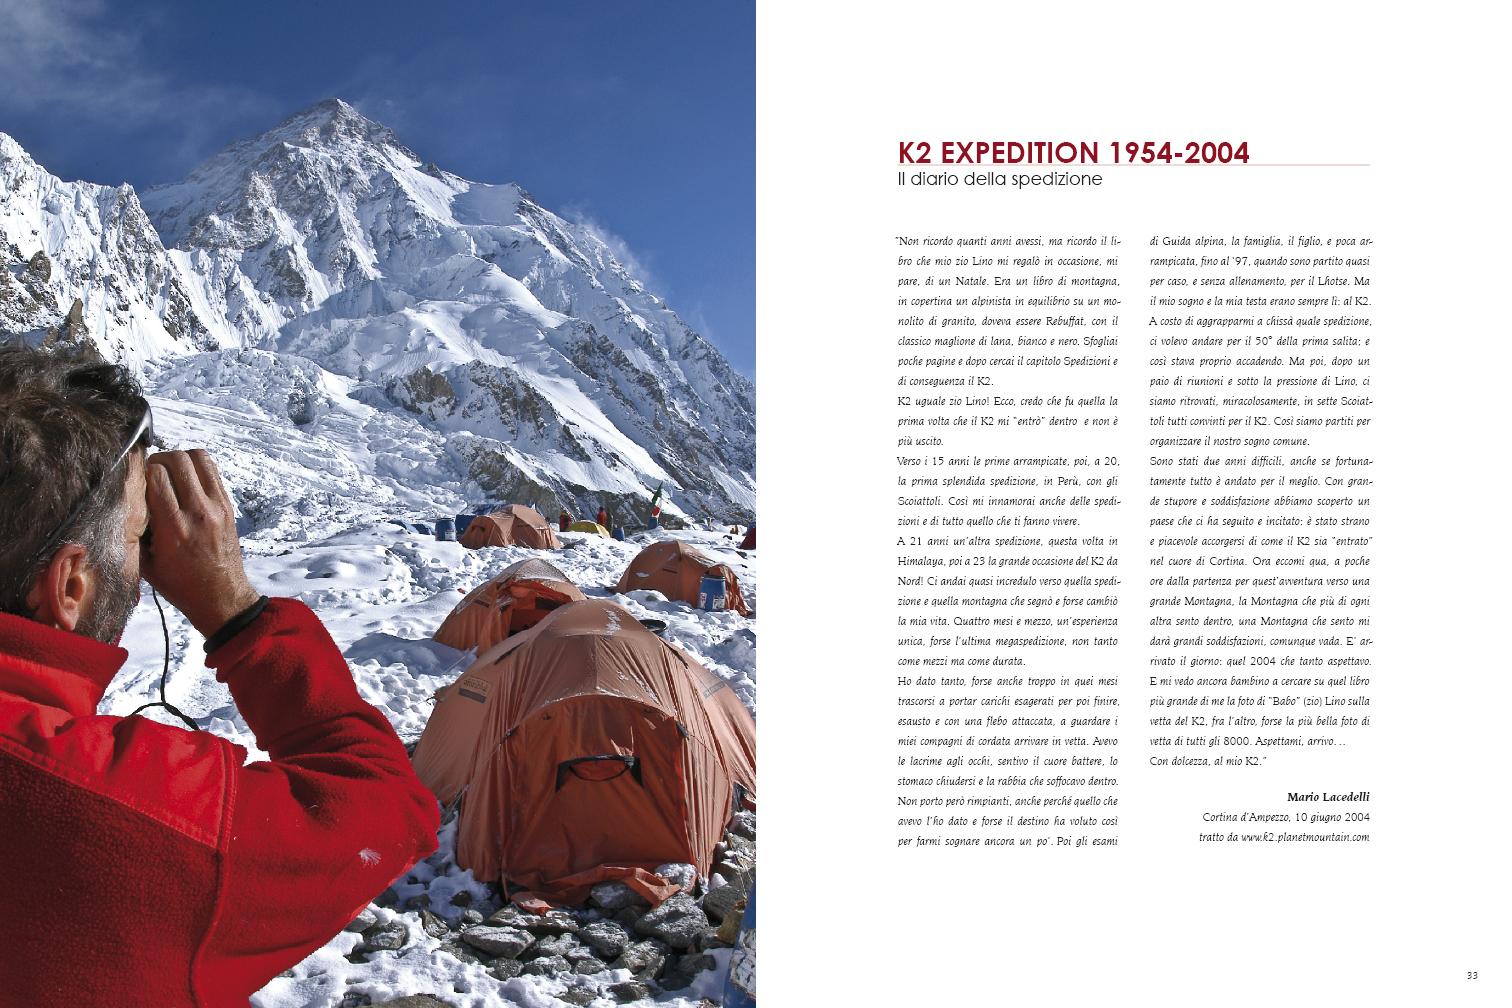 K2 EXPEDITION 1954-2004 Giuseppe Ghedina Fotografo - 018.jpg